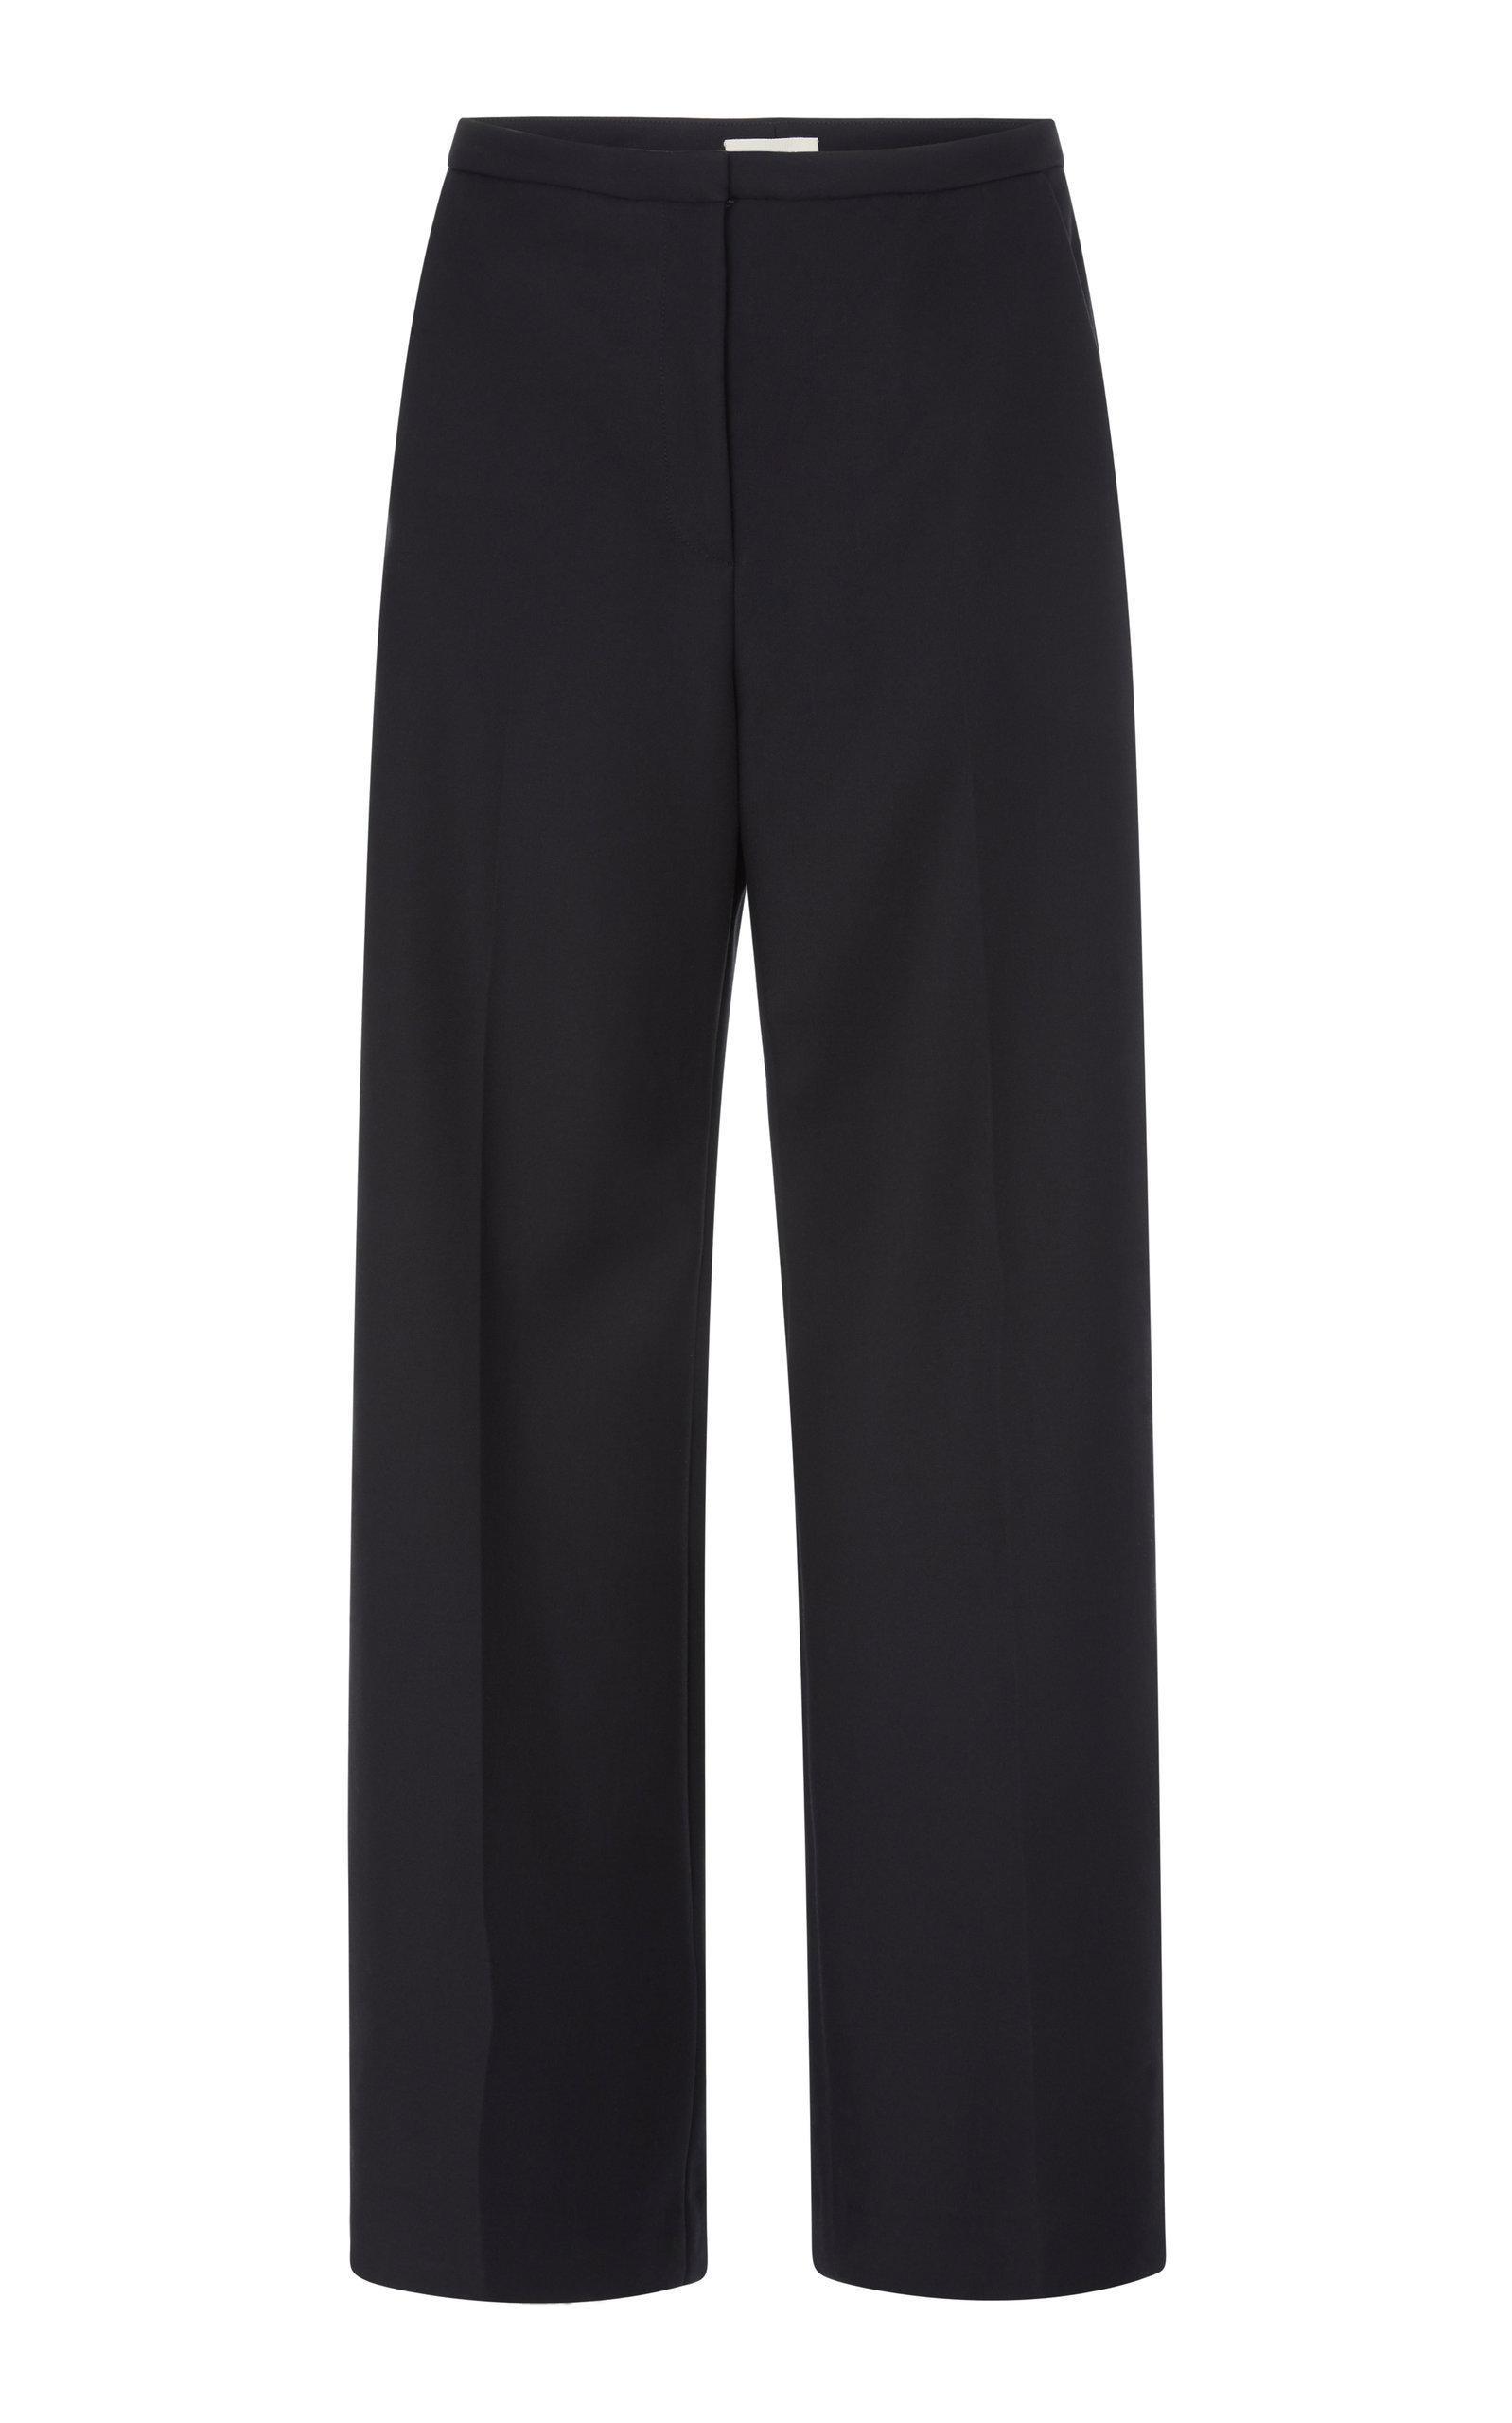 Khaite Charlize High-rise Straight-leg Pants In Black